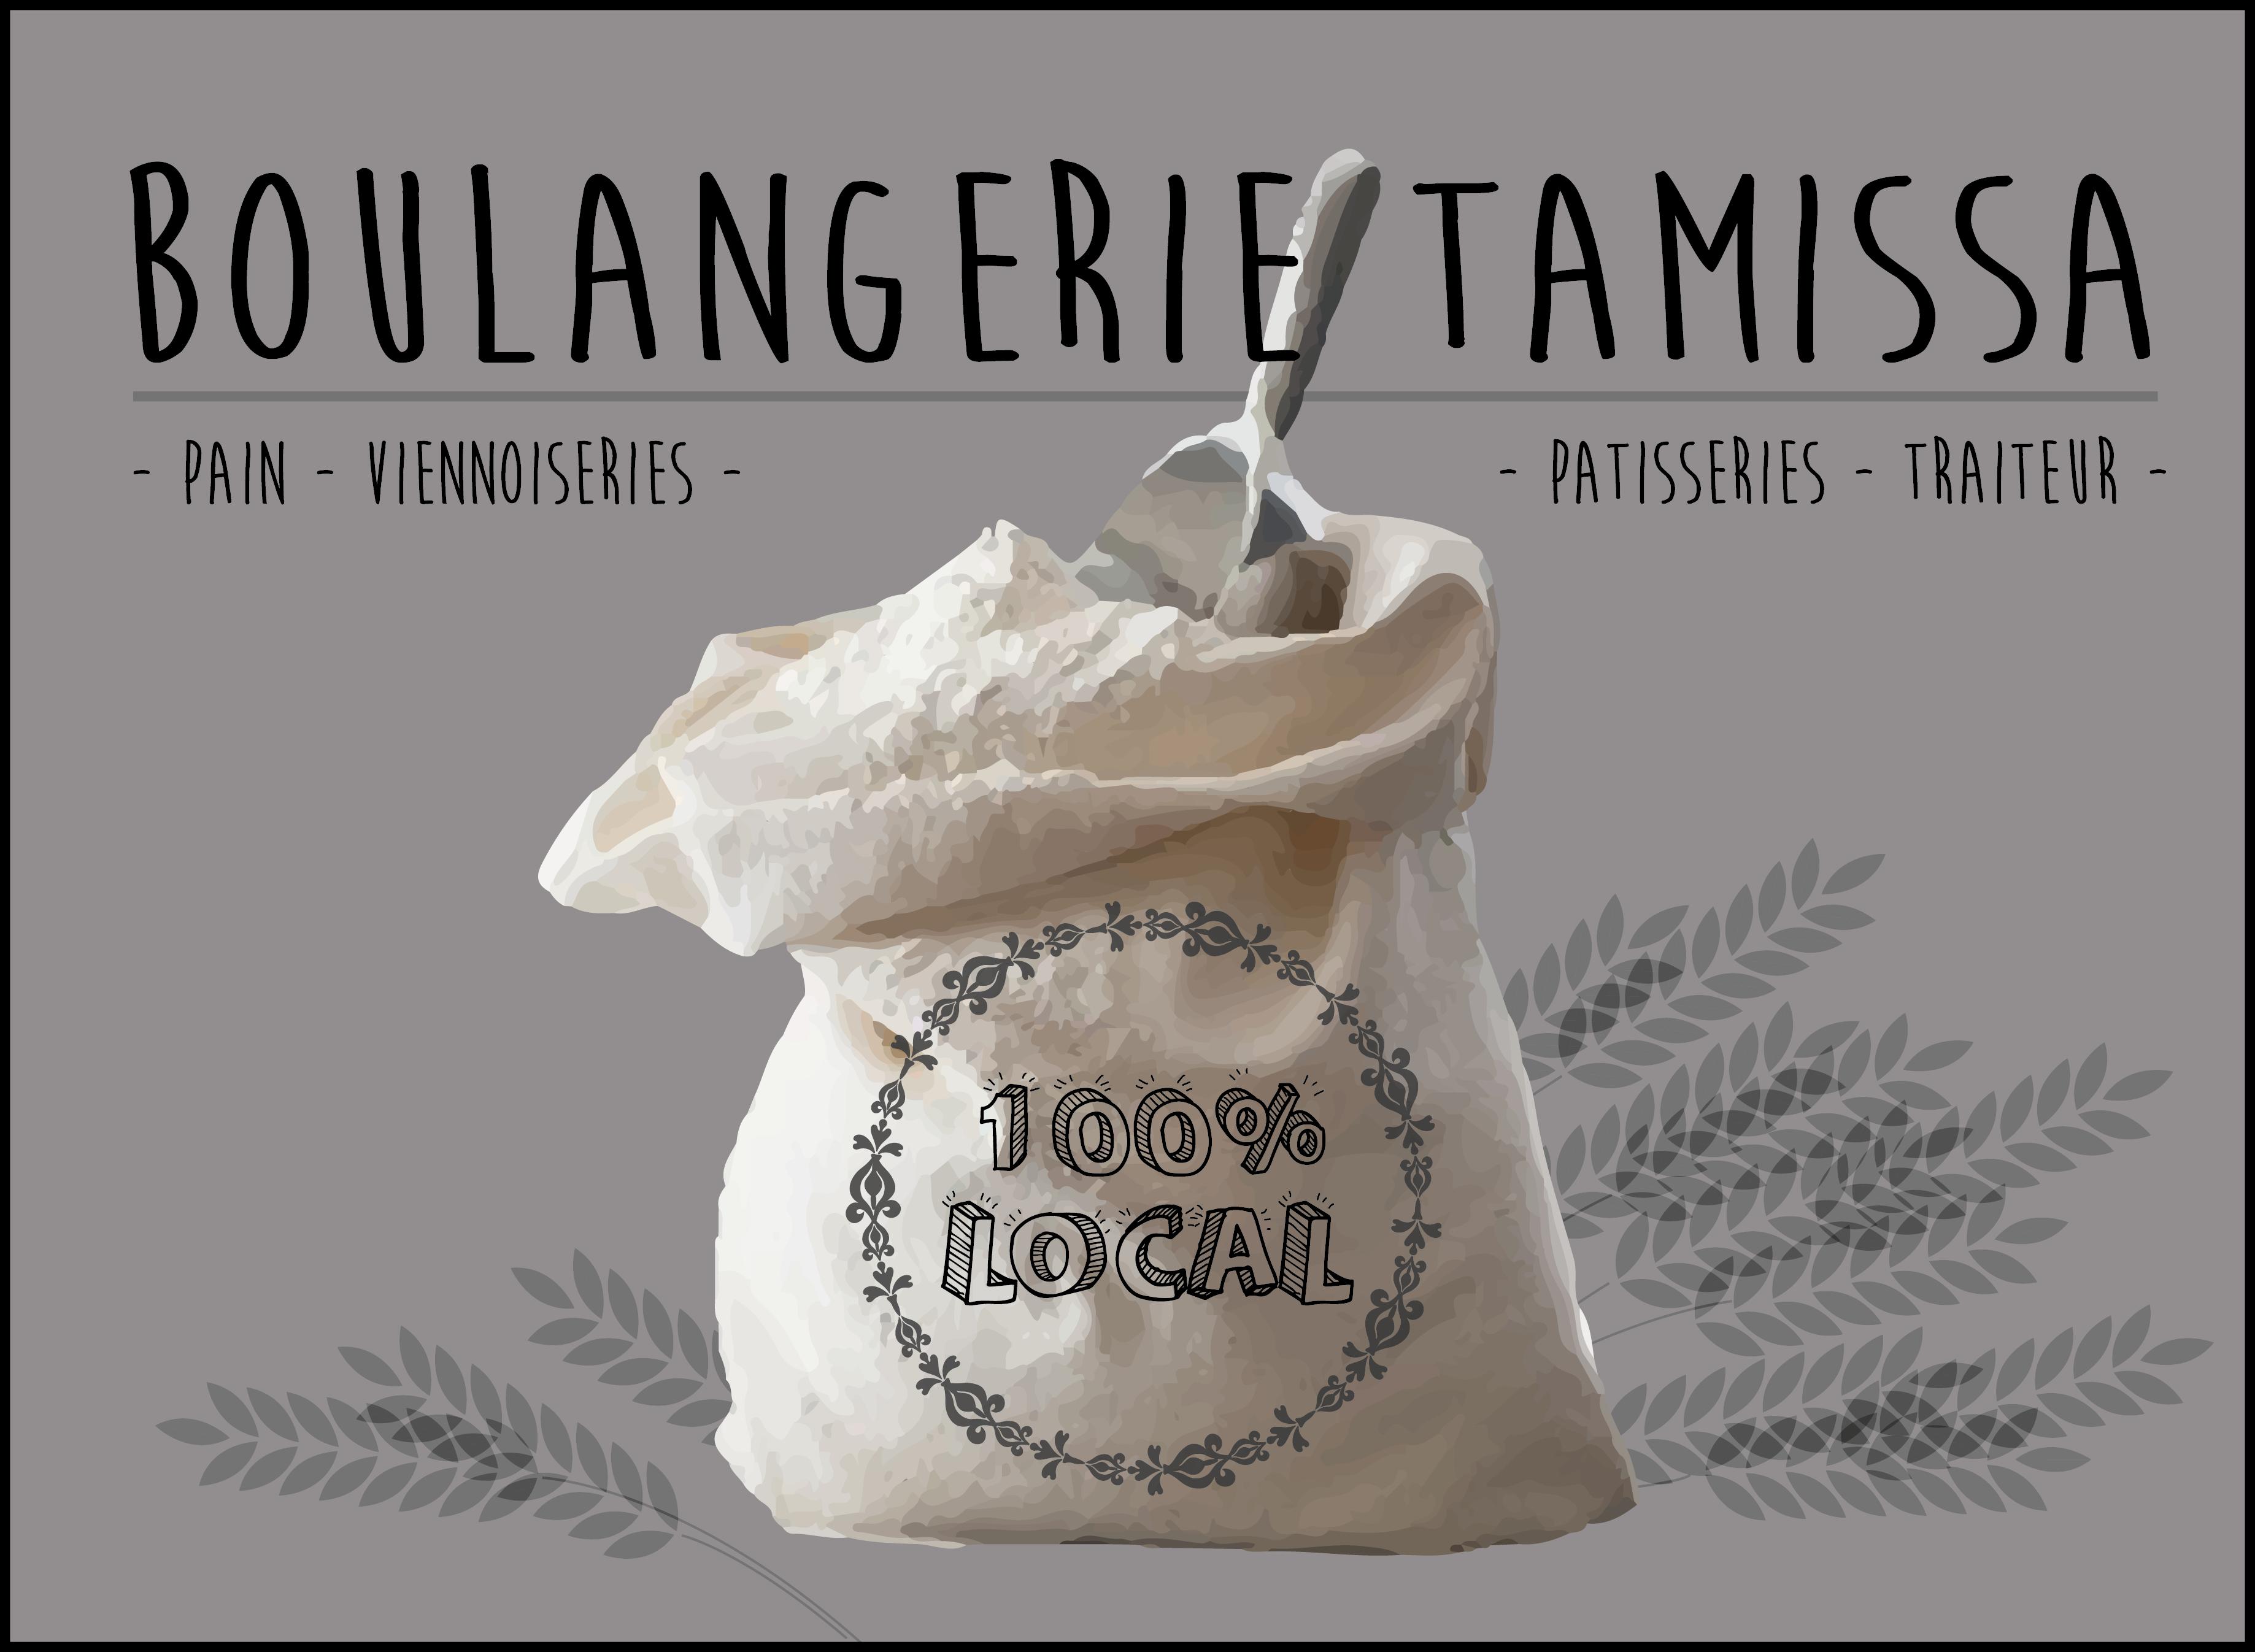 Boulangerie Tamissa - artisan boulanger - Lyon - partenaire